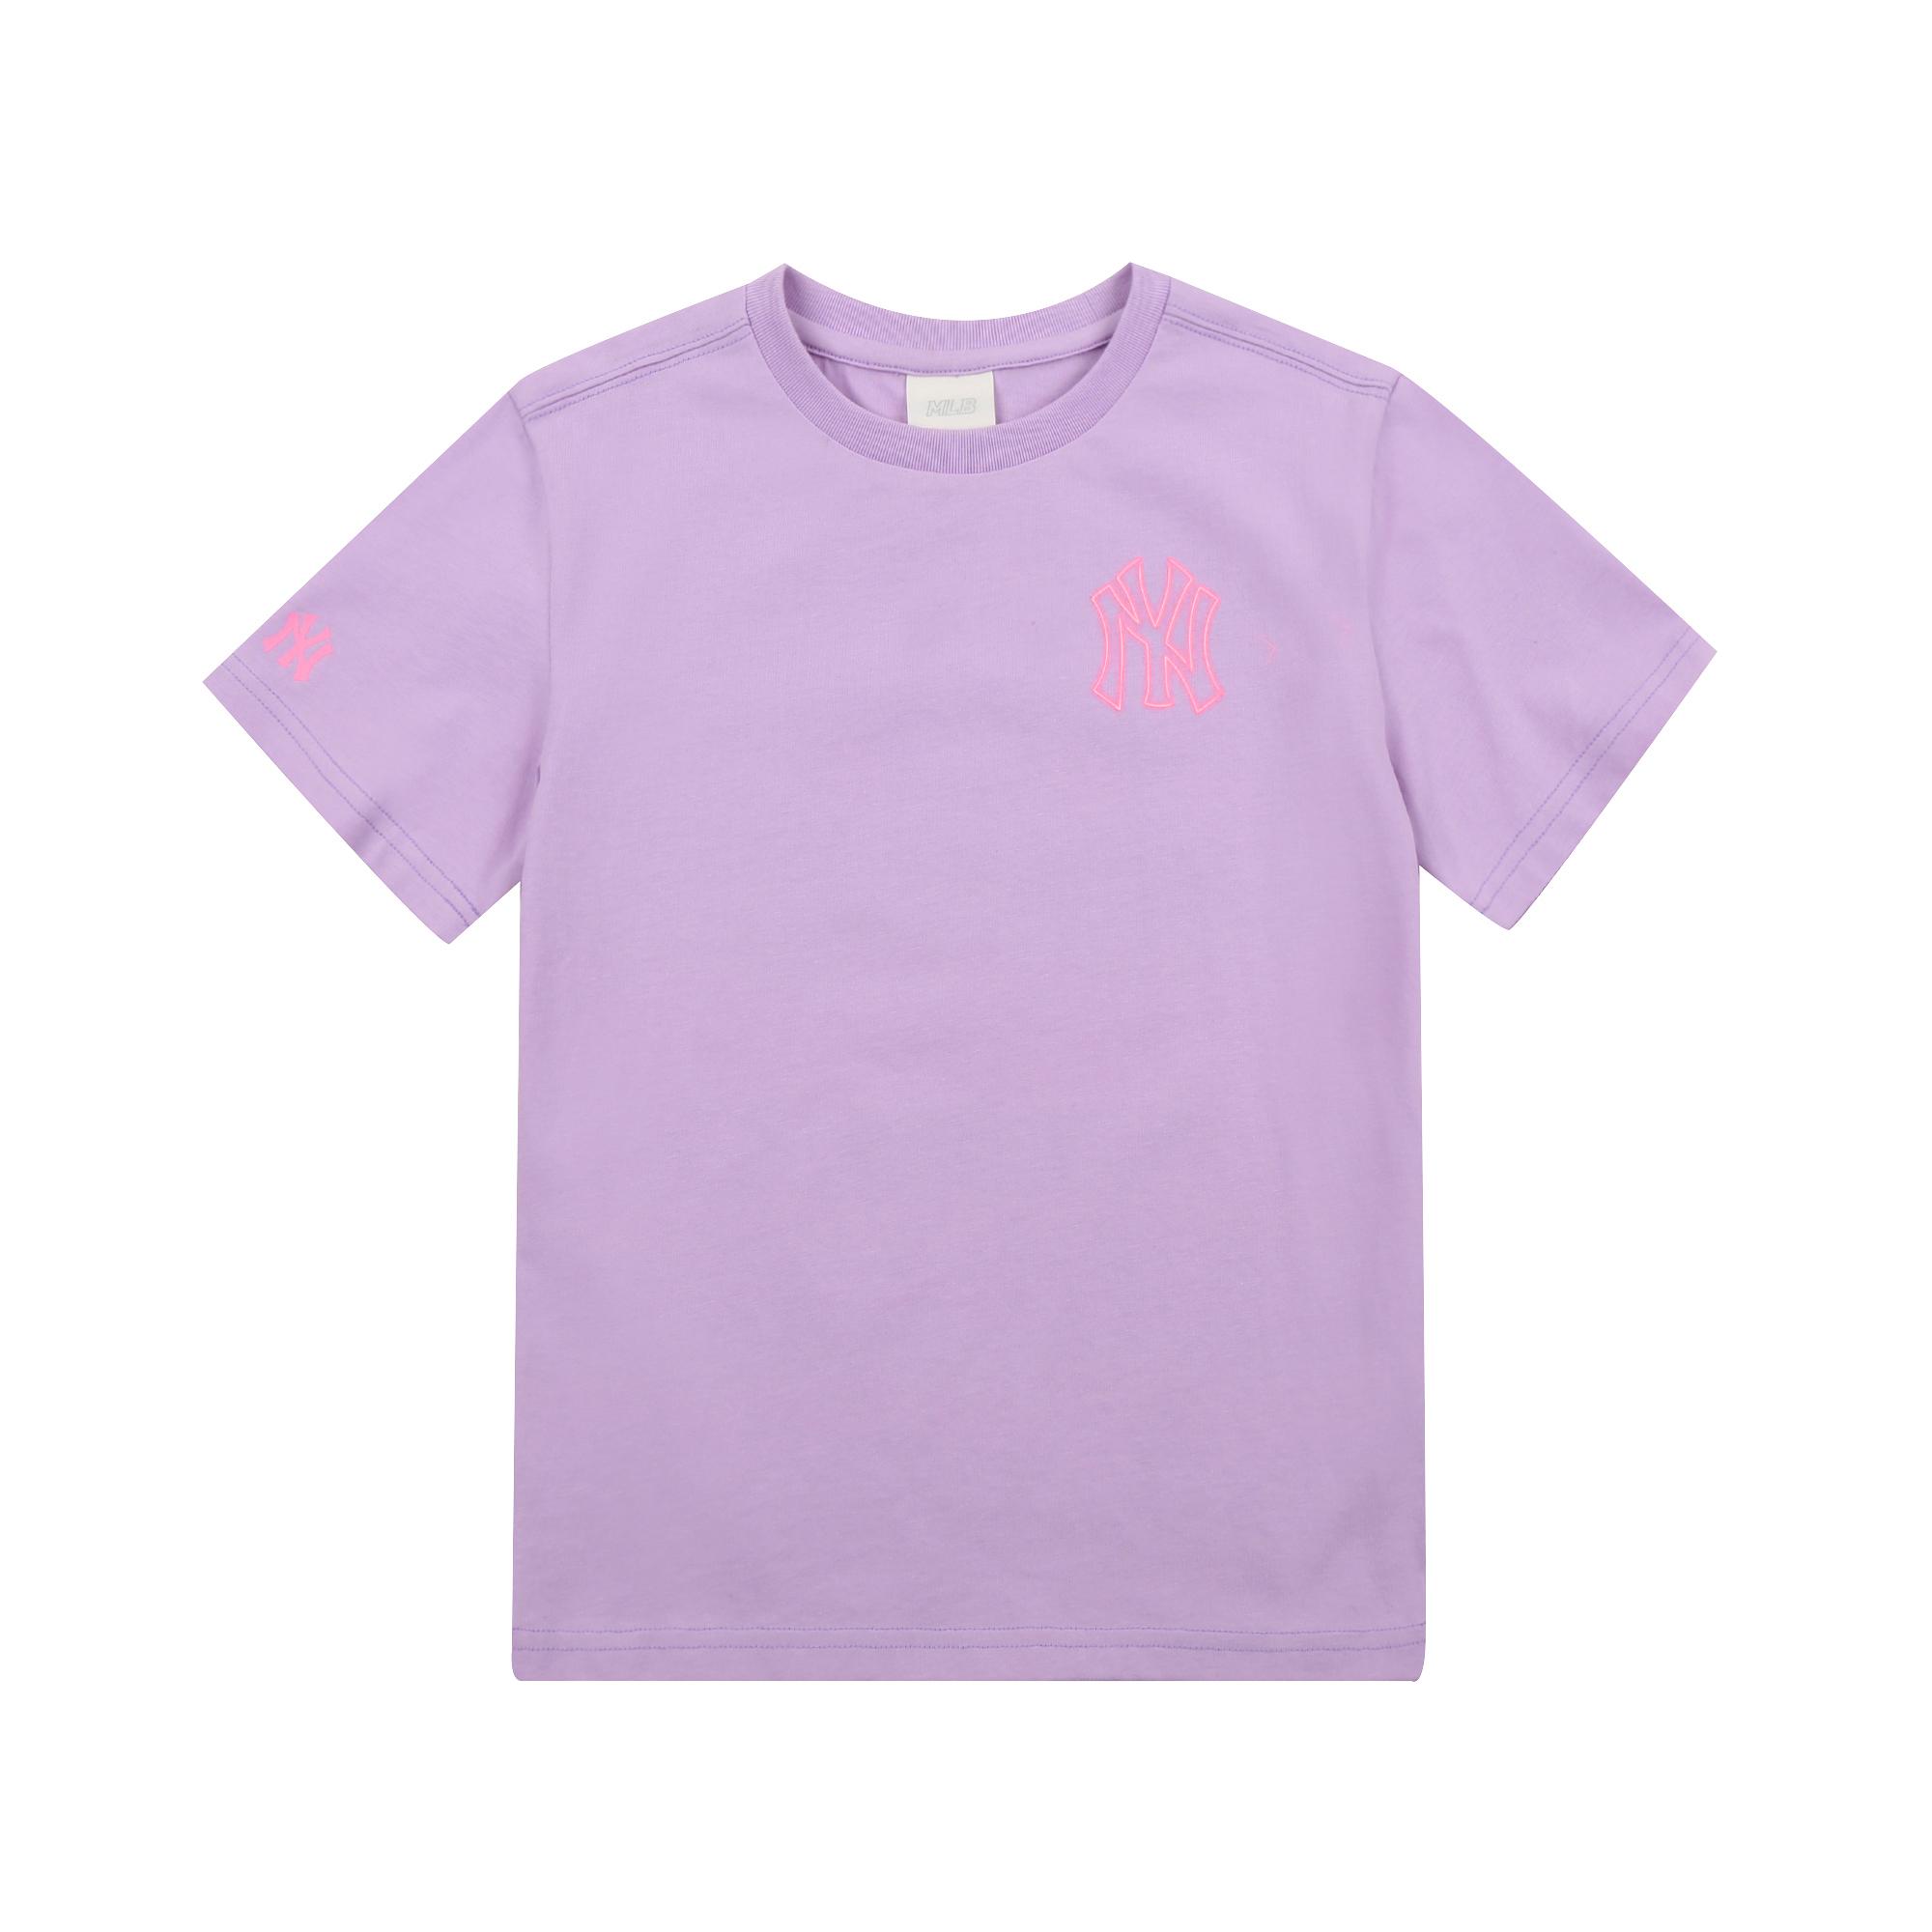 PLAY MLB 네온 반팔 티셔츠 뉴욕양키스